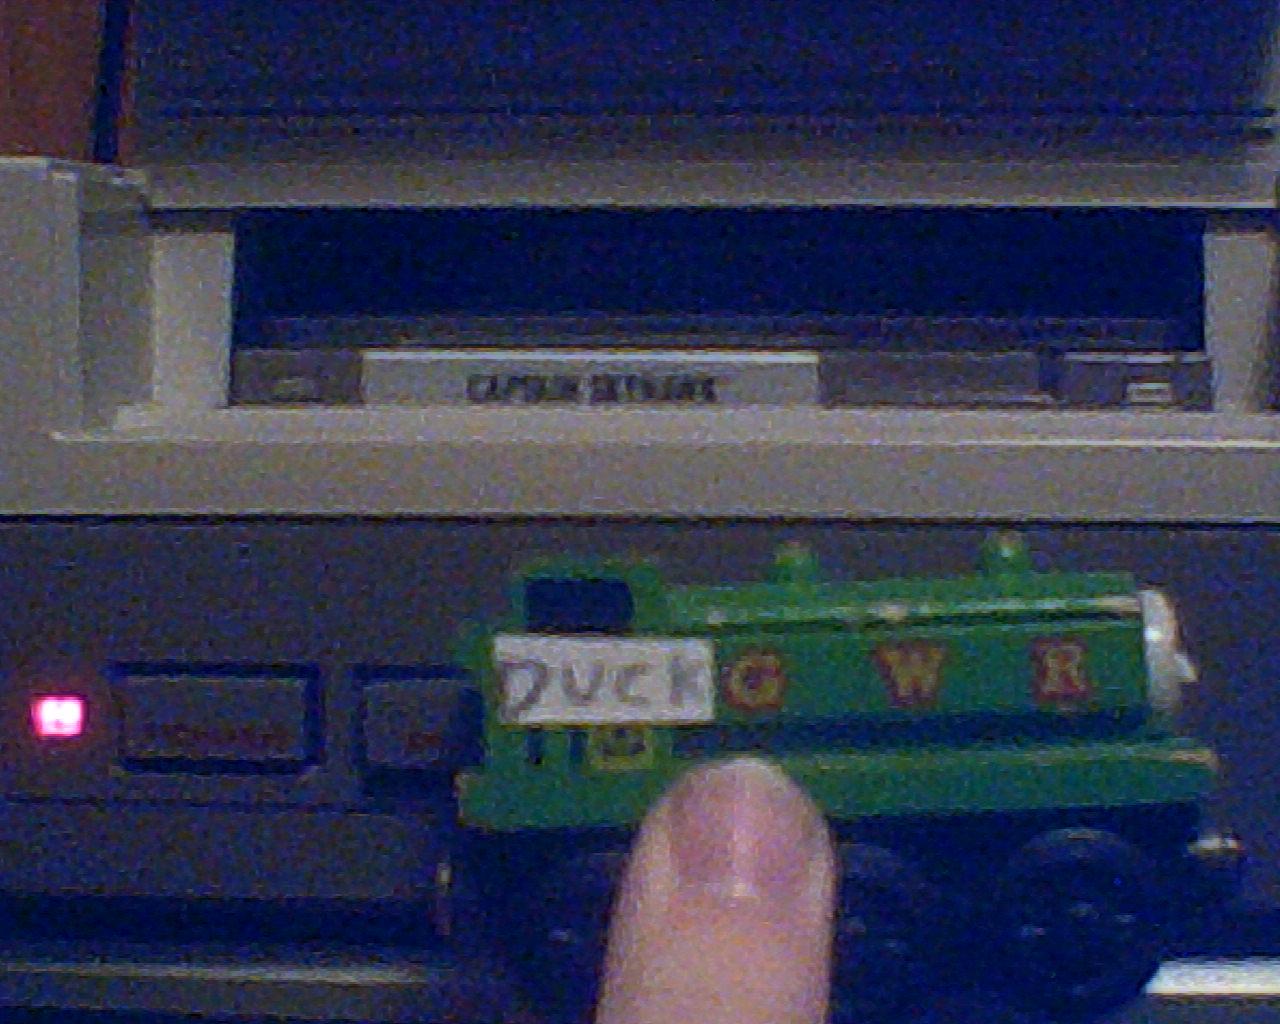 DuckGWR: Captain Skyhawk (NES/Famicom) 91,200 points on 2015-01-17 20:49:27